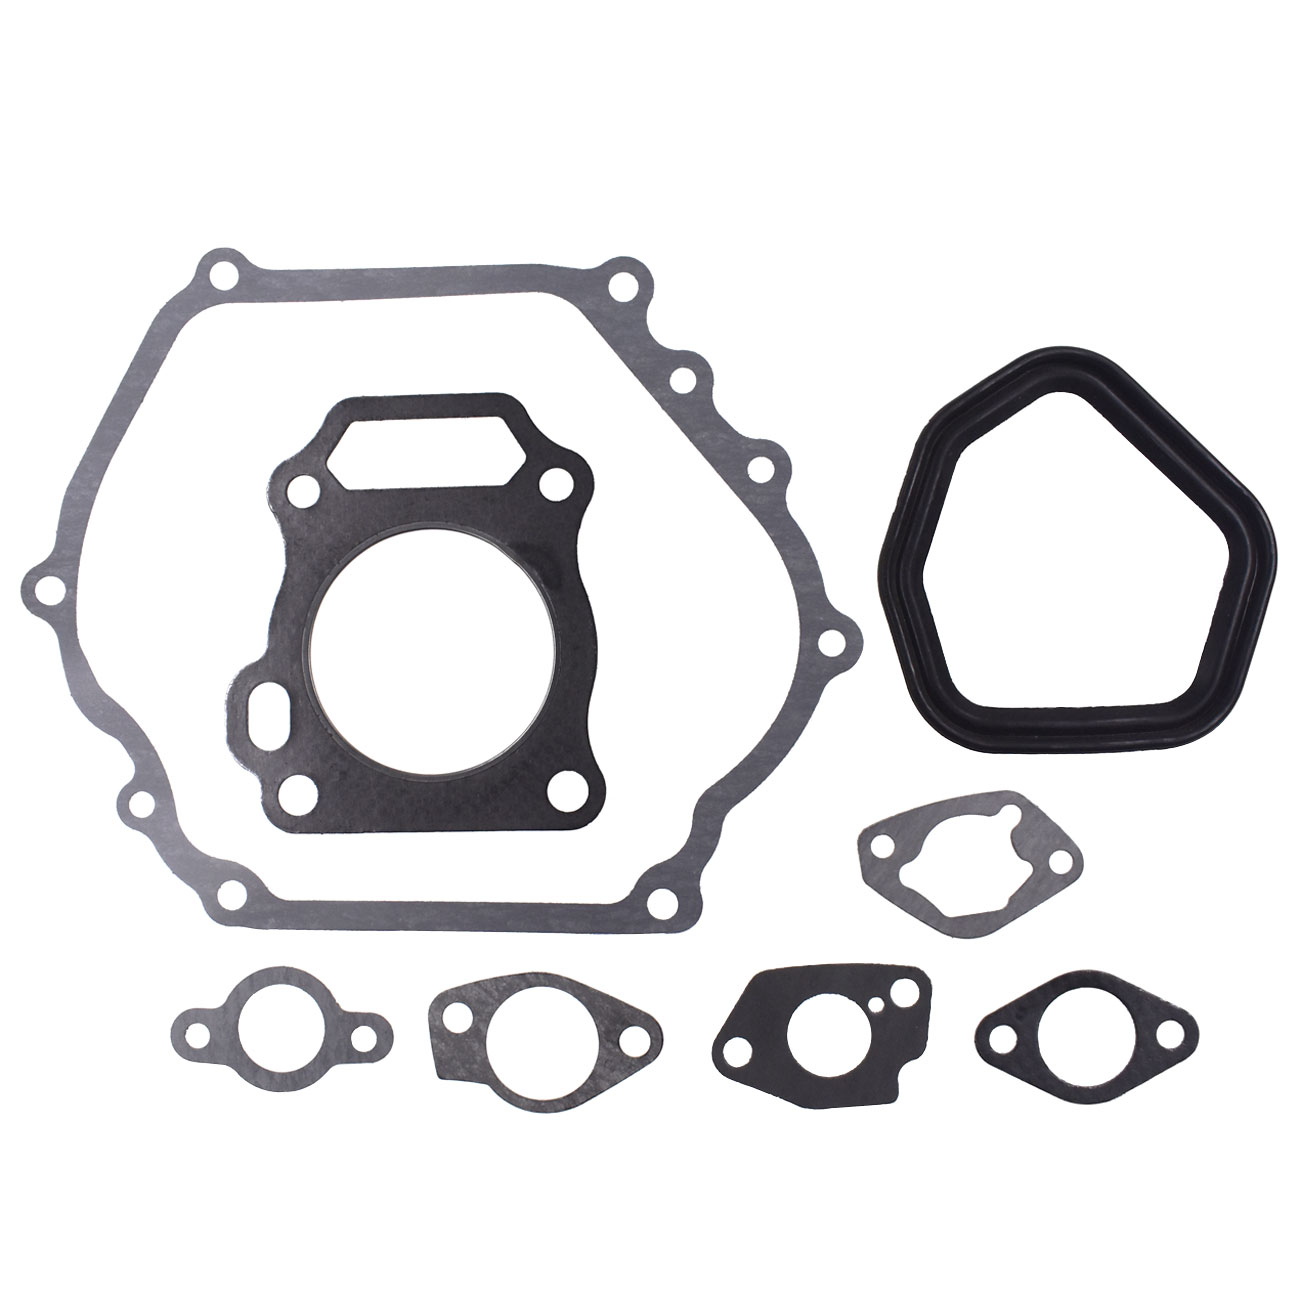 Full Engine Gasket Kit For Honda GX240 8HP Lawn Mower Replacement